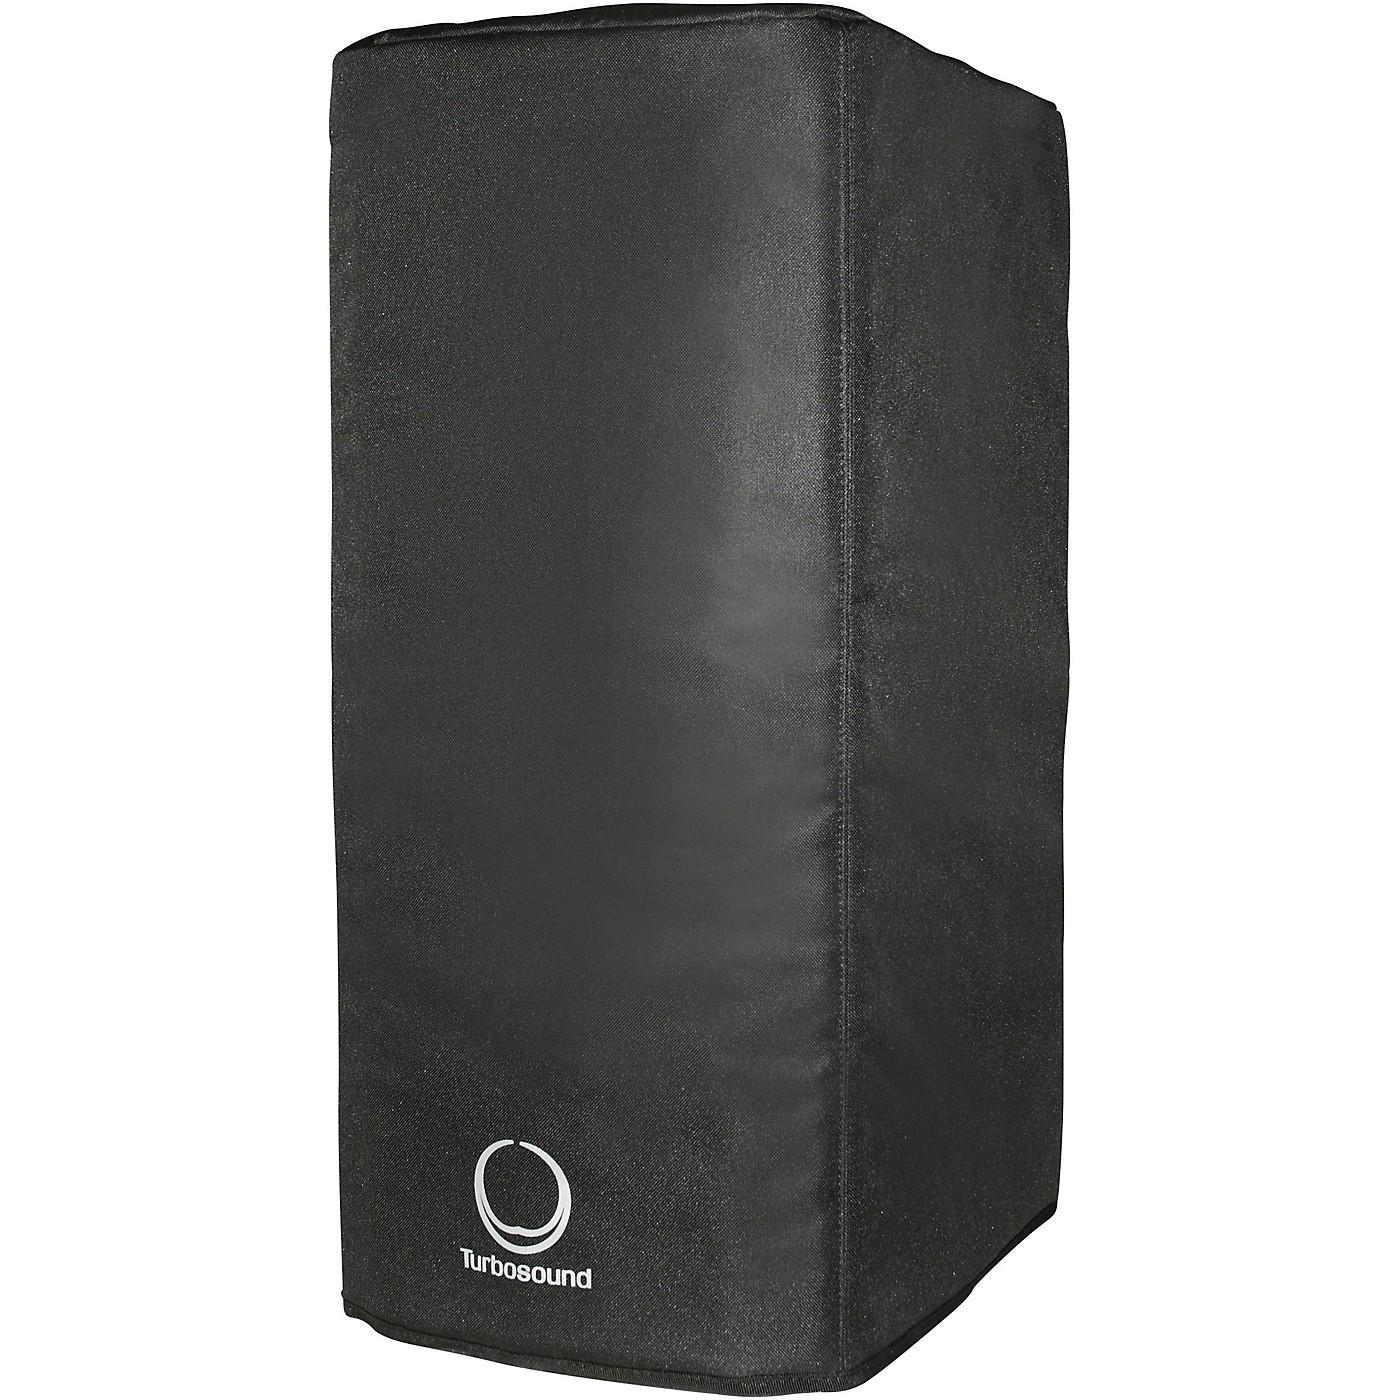 Turbosound iP1000-PC Speaker Bag for iP1000 Subwoofer thumbnail